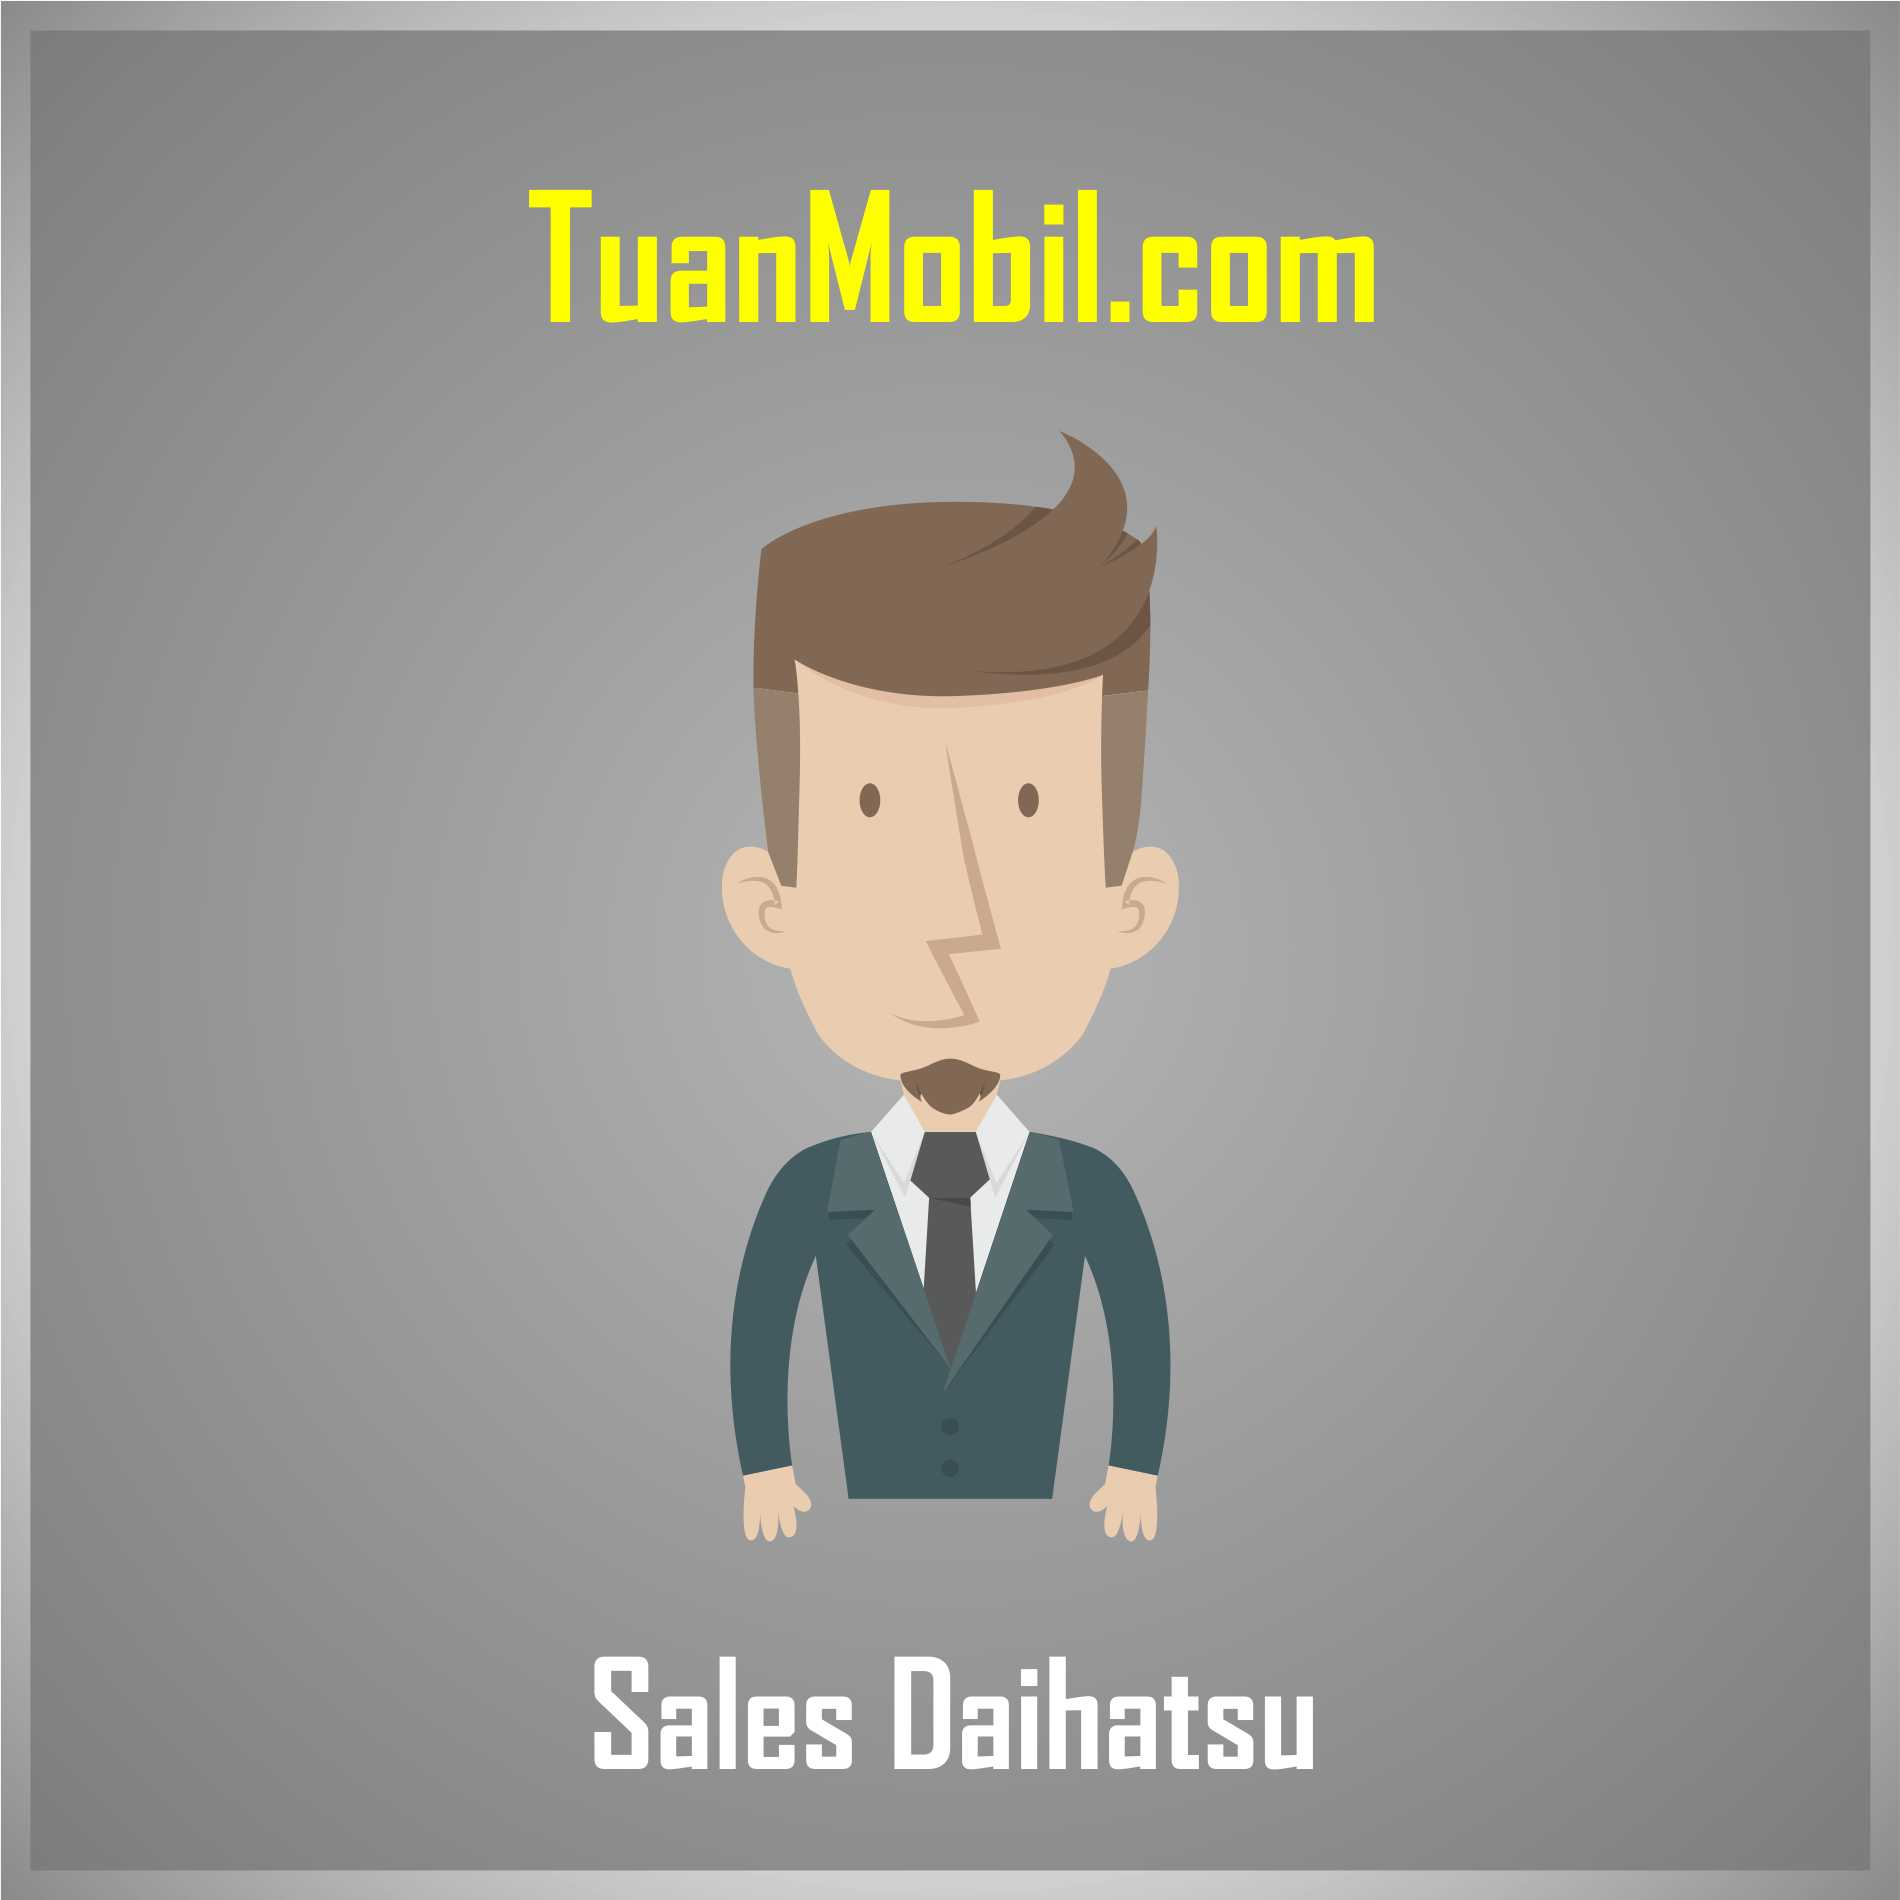 Sales Daihatsu pondok-pucung